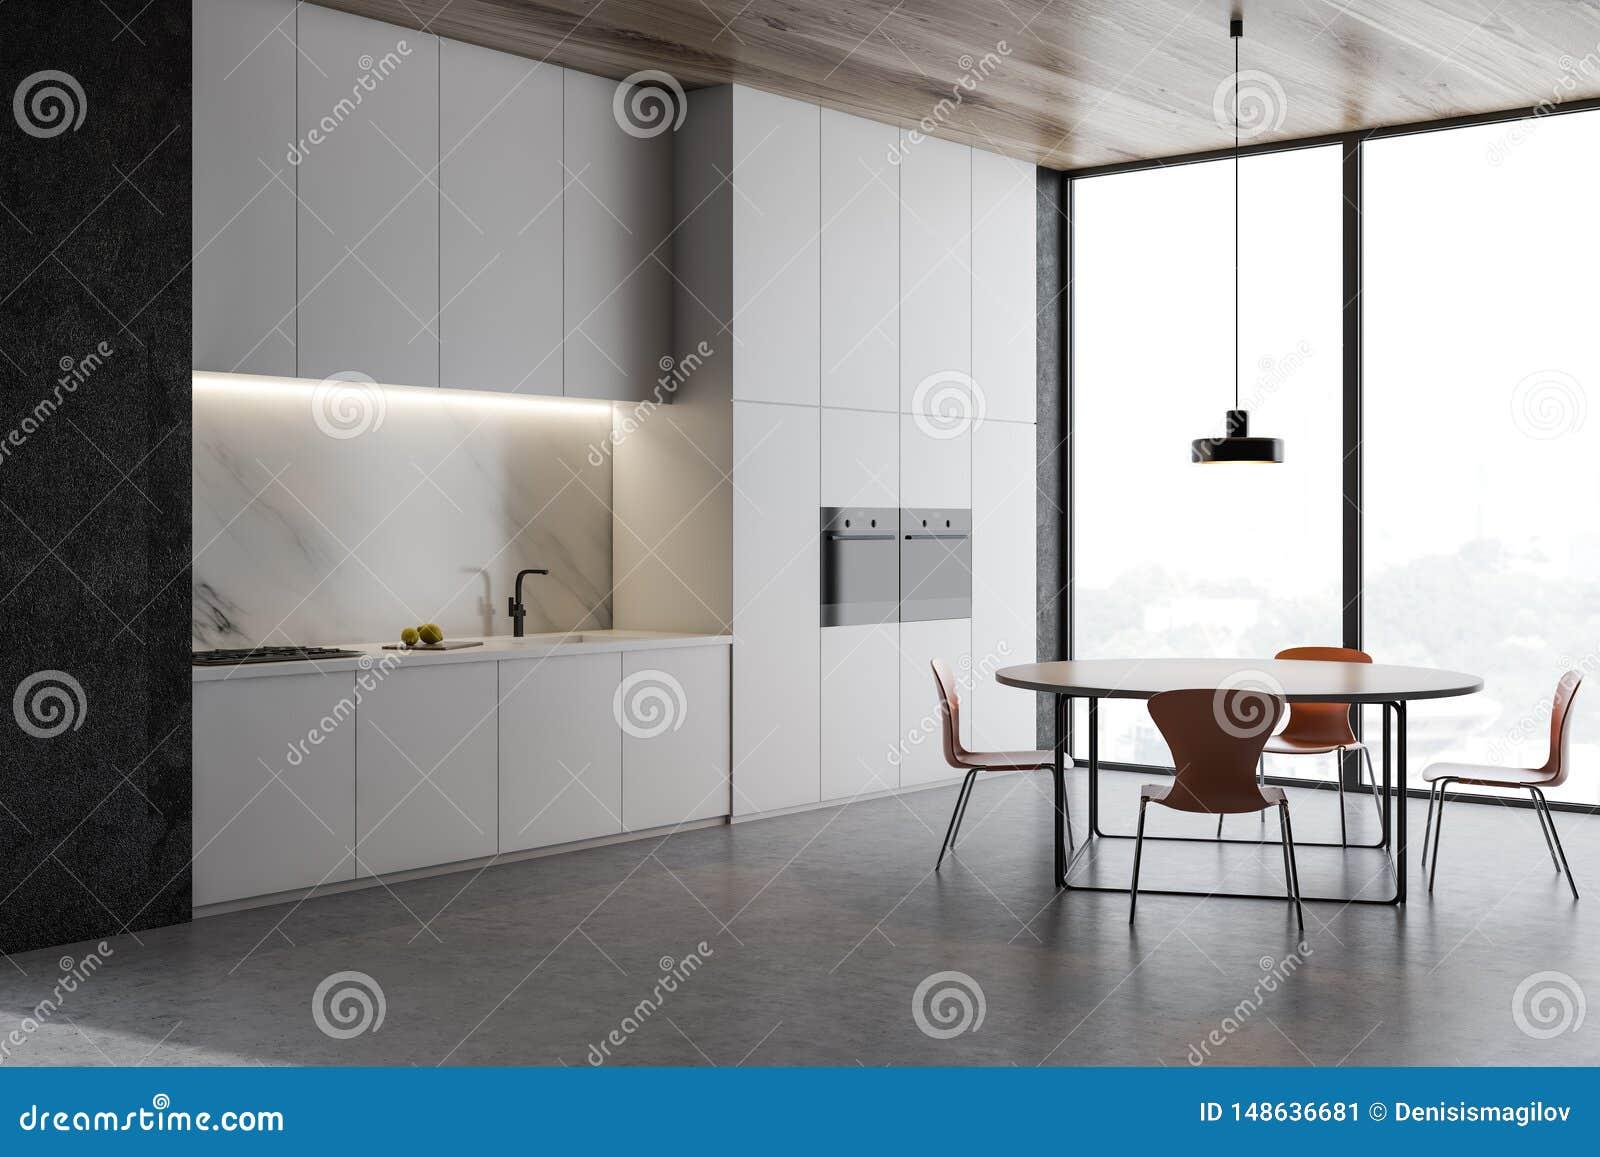 Loft kuchni betonowy k?t, kontuary i st??,